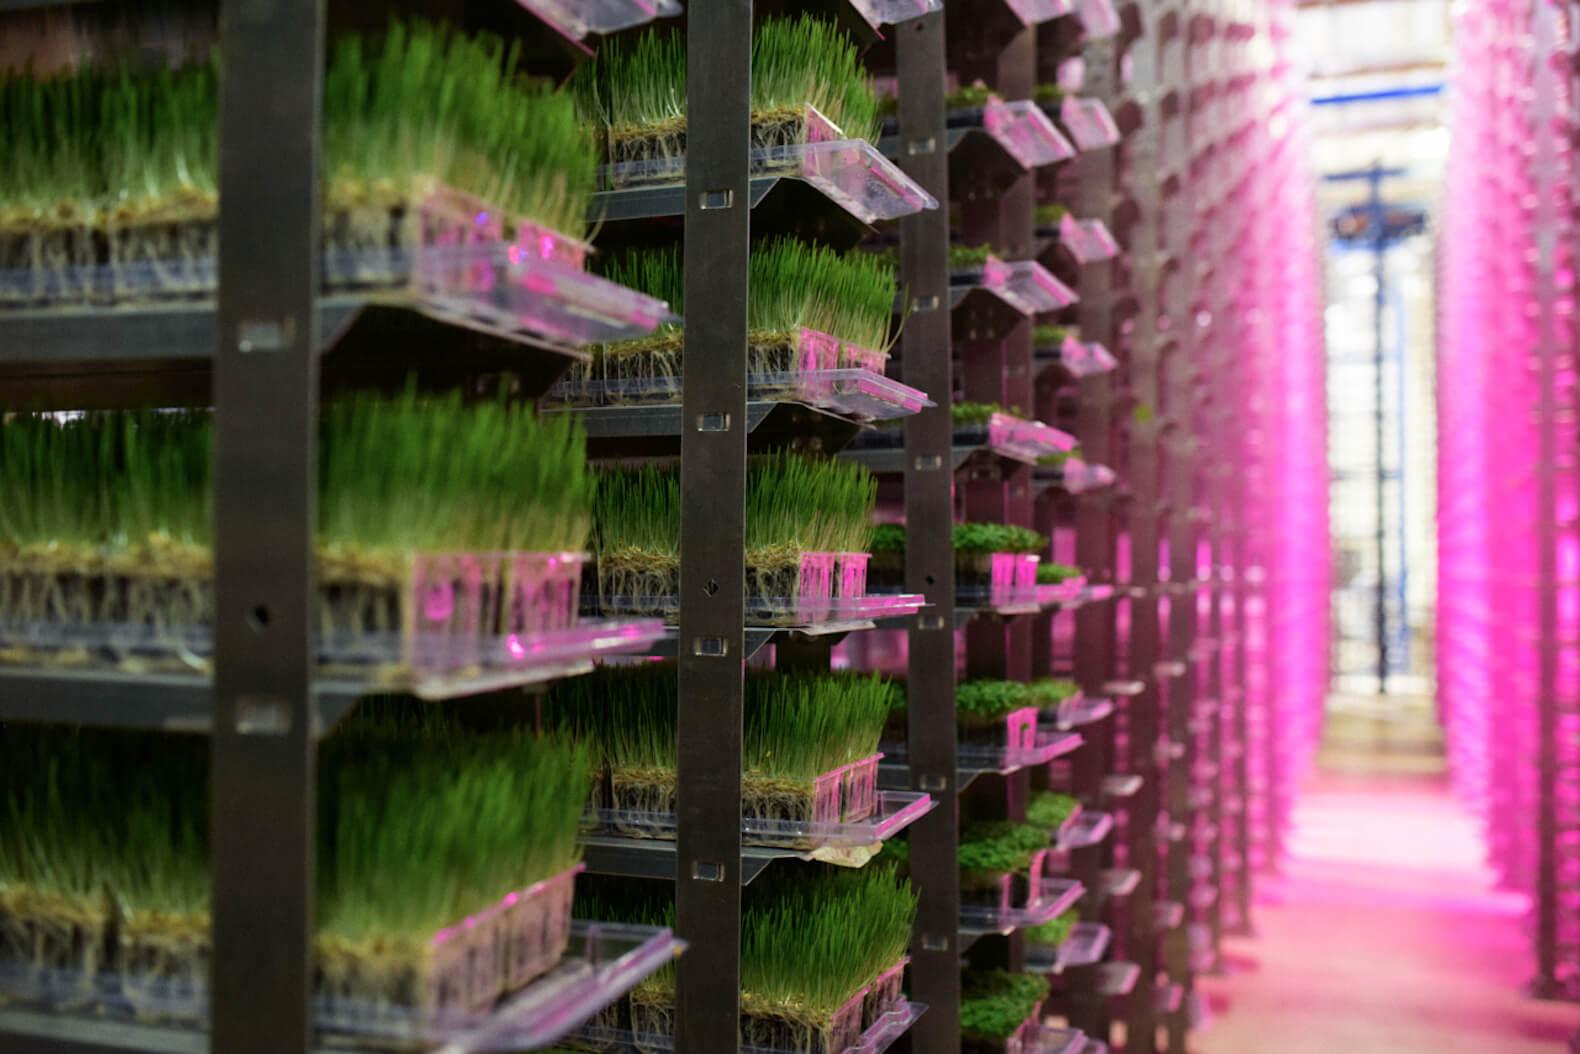 indoor agriculture farming 32727